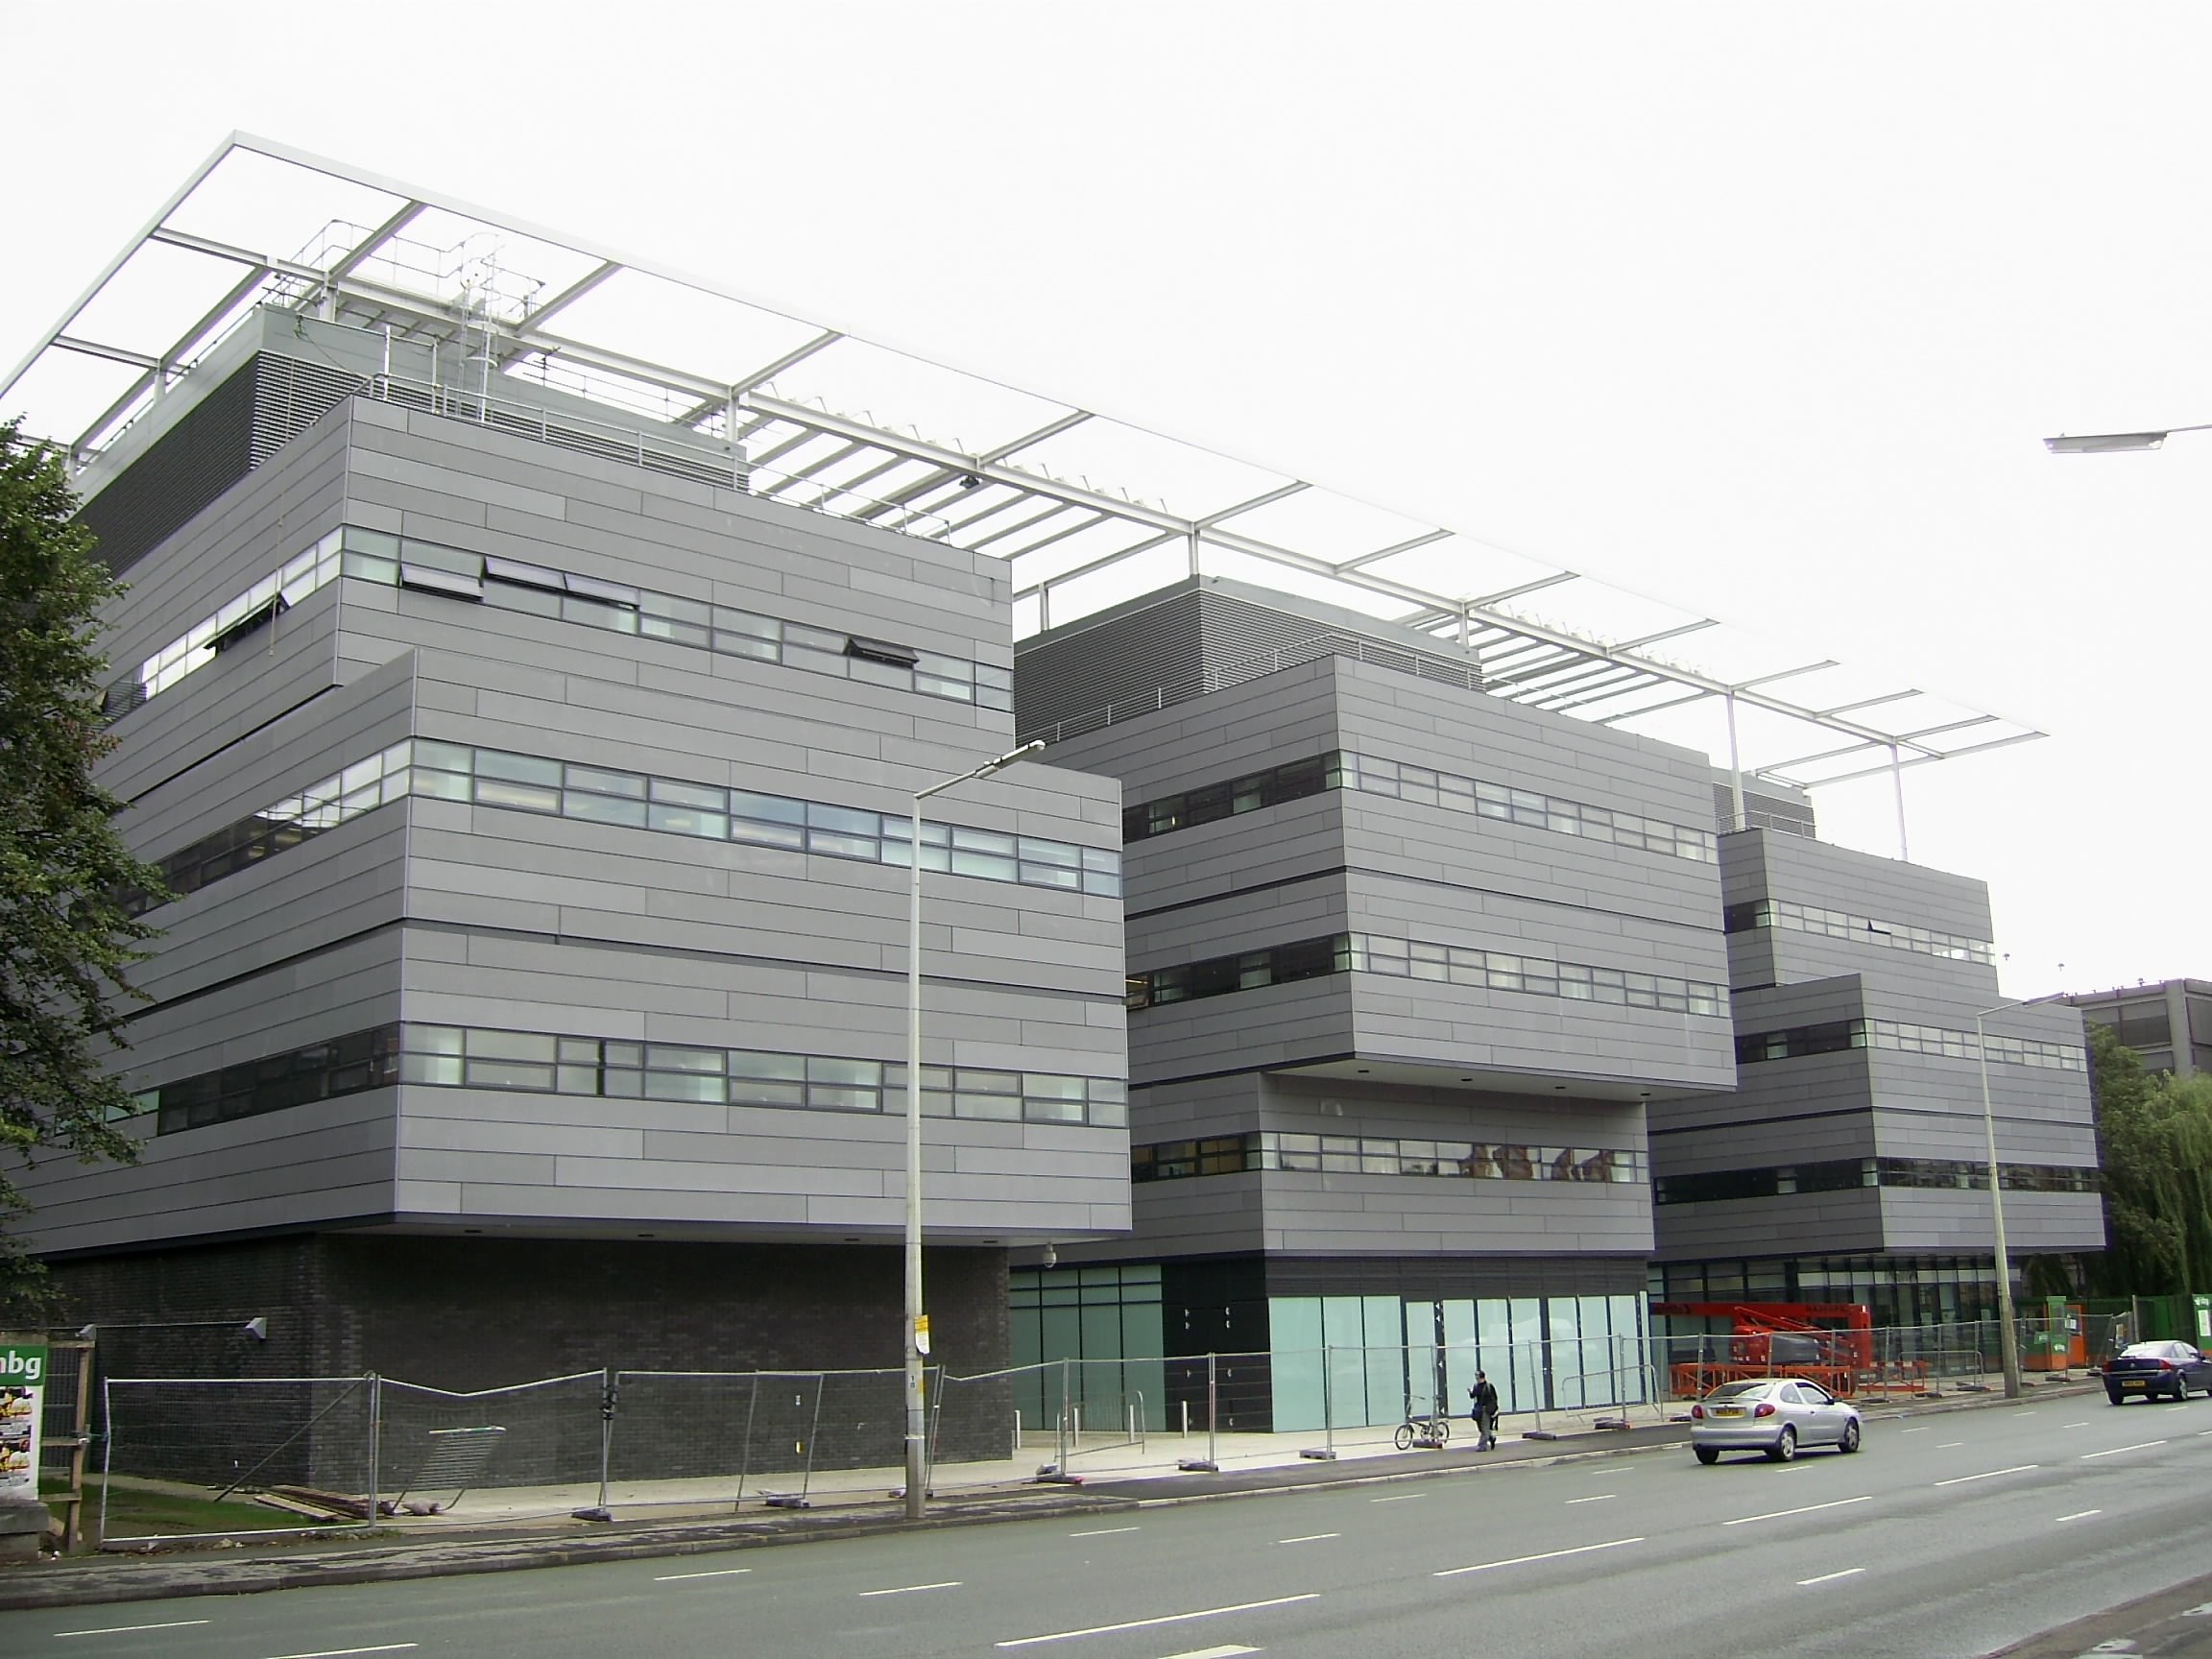 University Of Manchester Chemistry Building